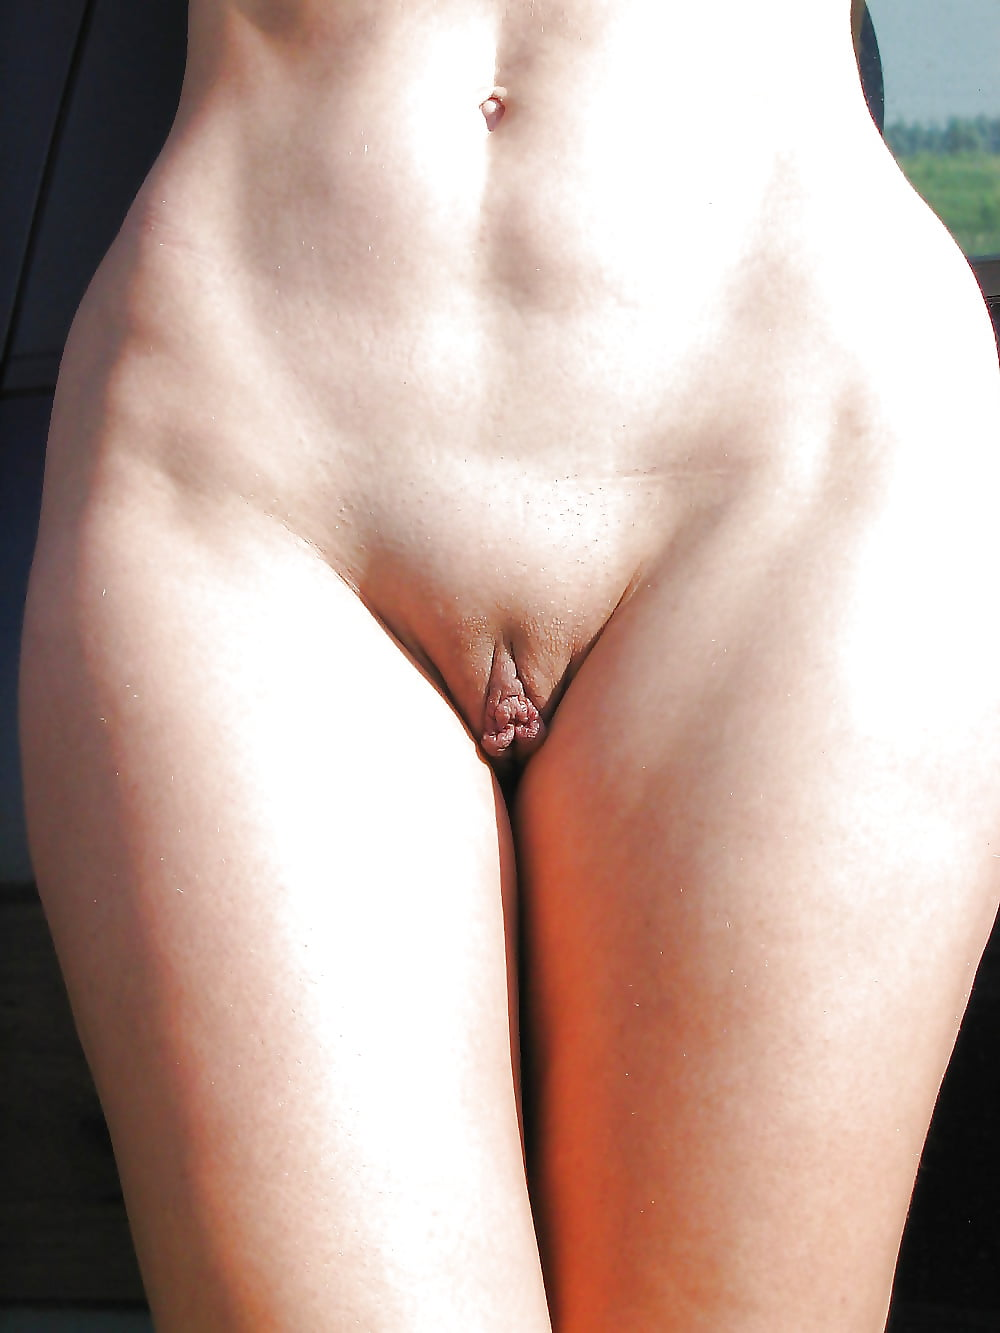 chastnoe-foto-devushek-vidno-genitalii-russkiy-seks-starushkami